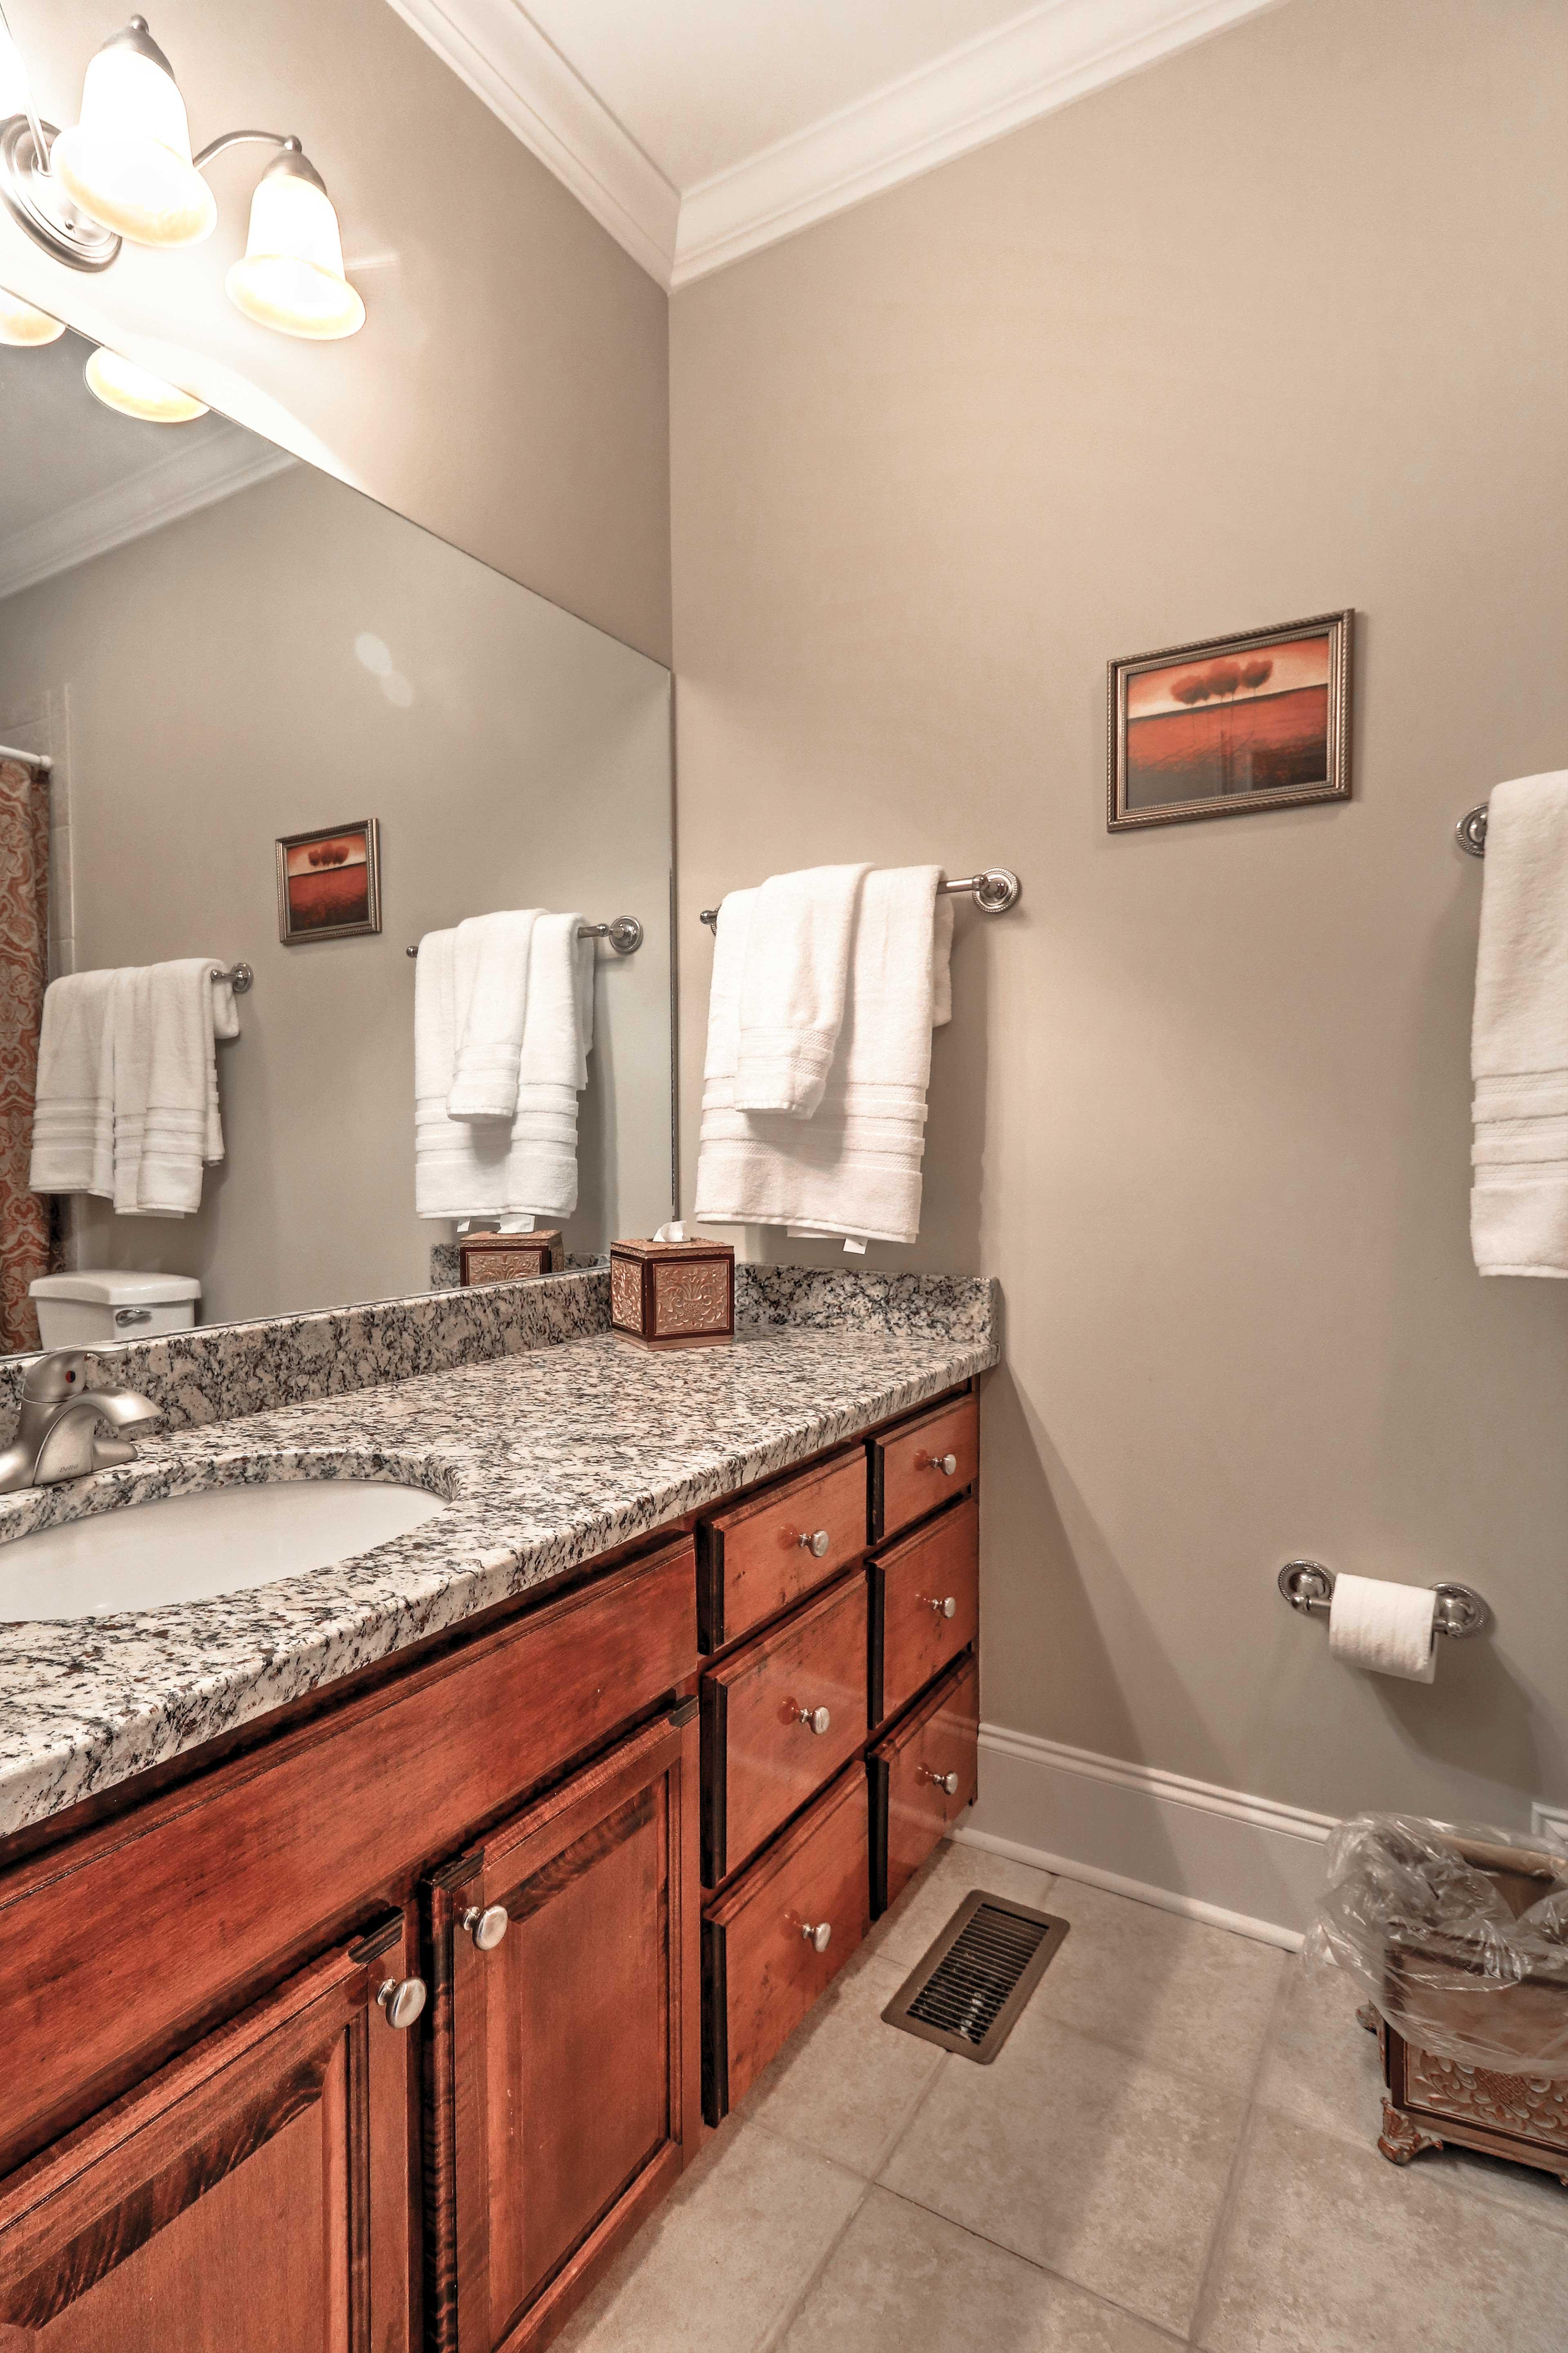 Complete nightly bedtime routines in this en-suite bathroom with granite countertops.